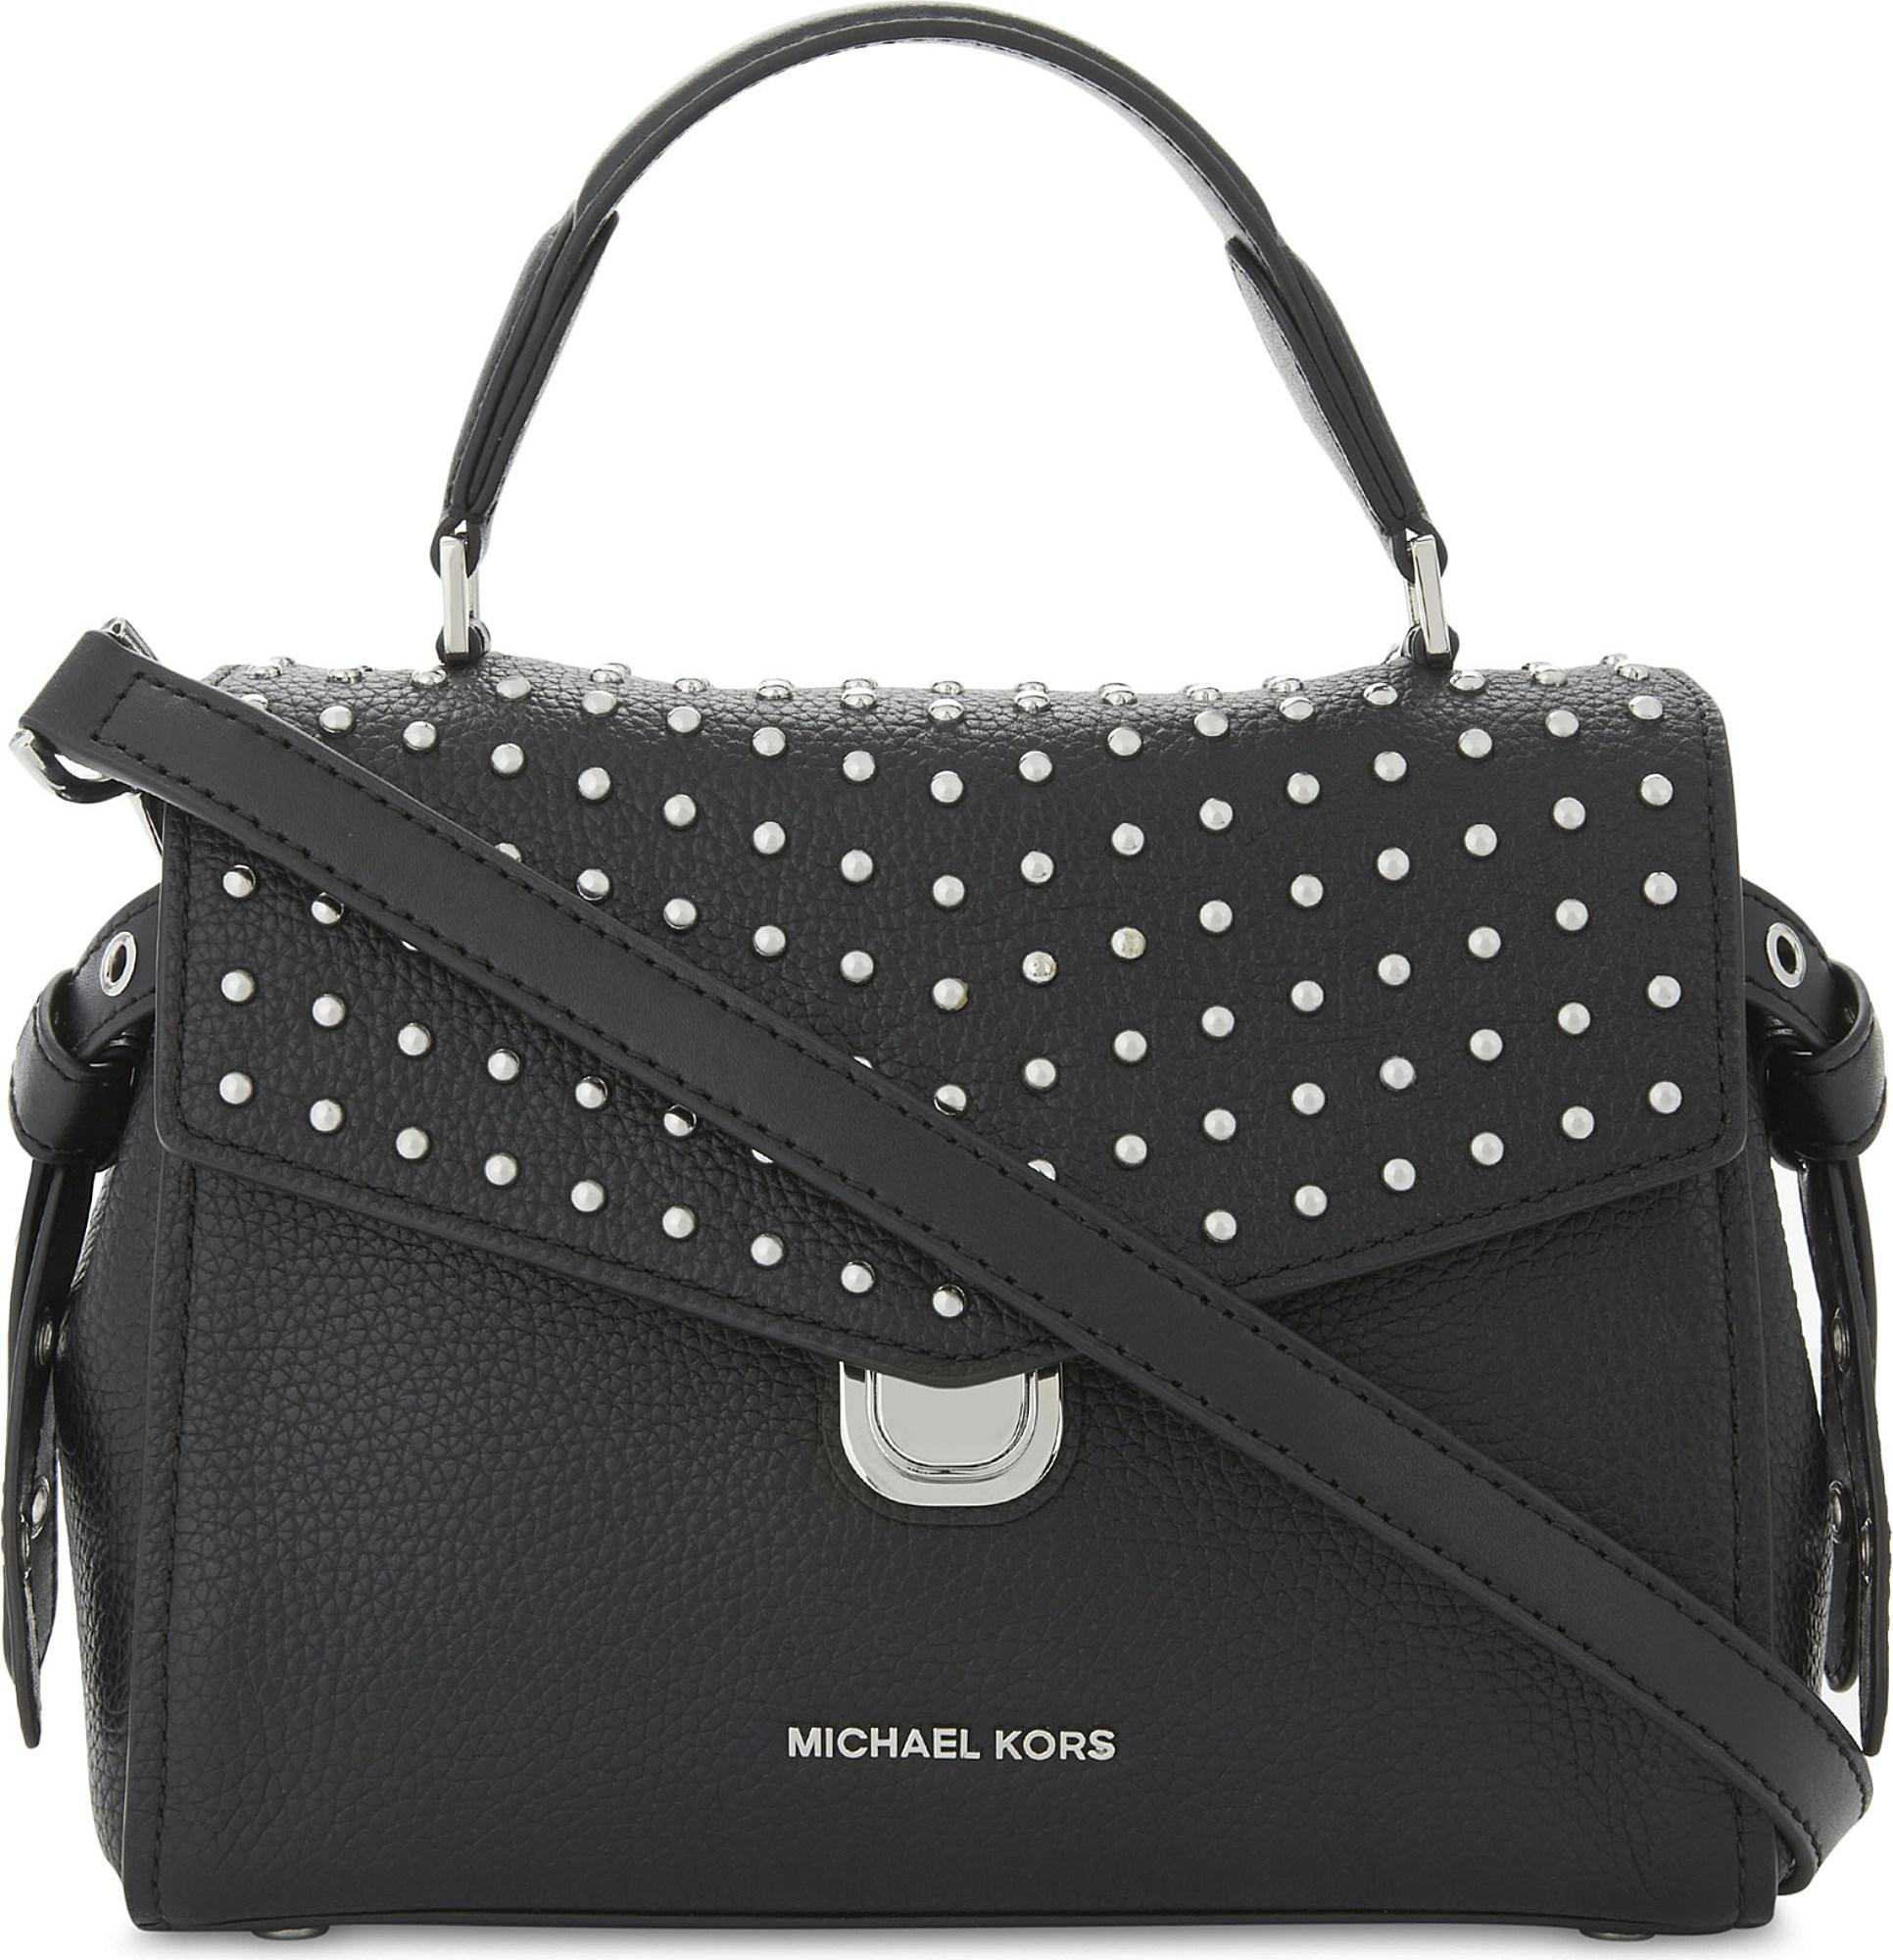 6da8ce5888bb MICHAEL Michael Kors Bristol Studded Leather Satchel Bag in Black - Lyst